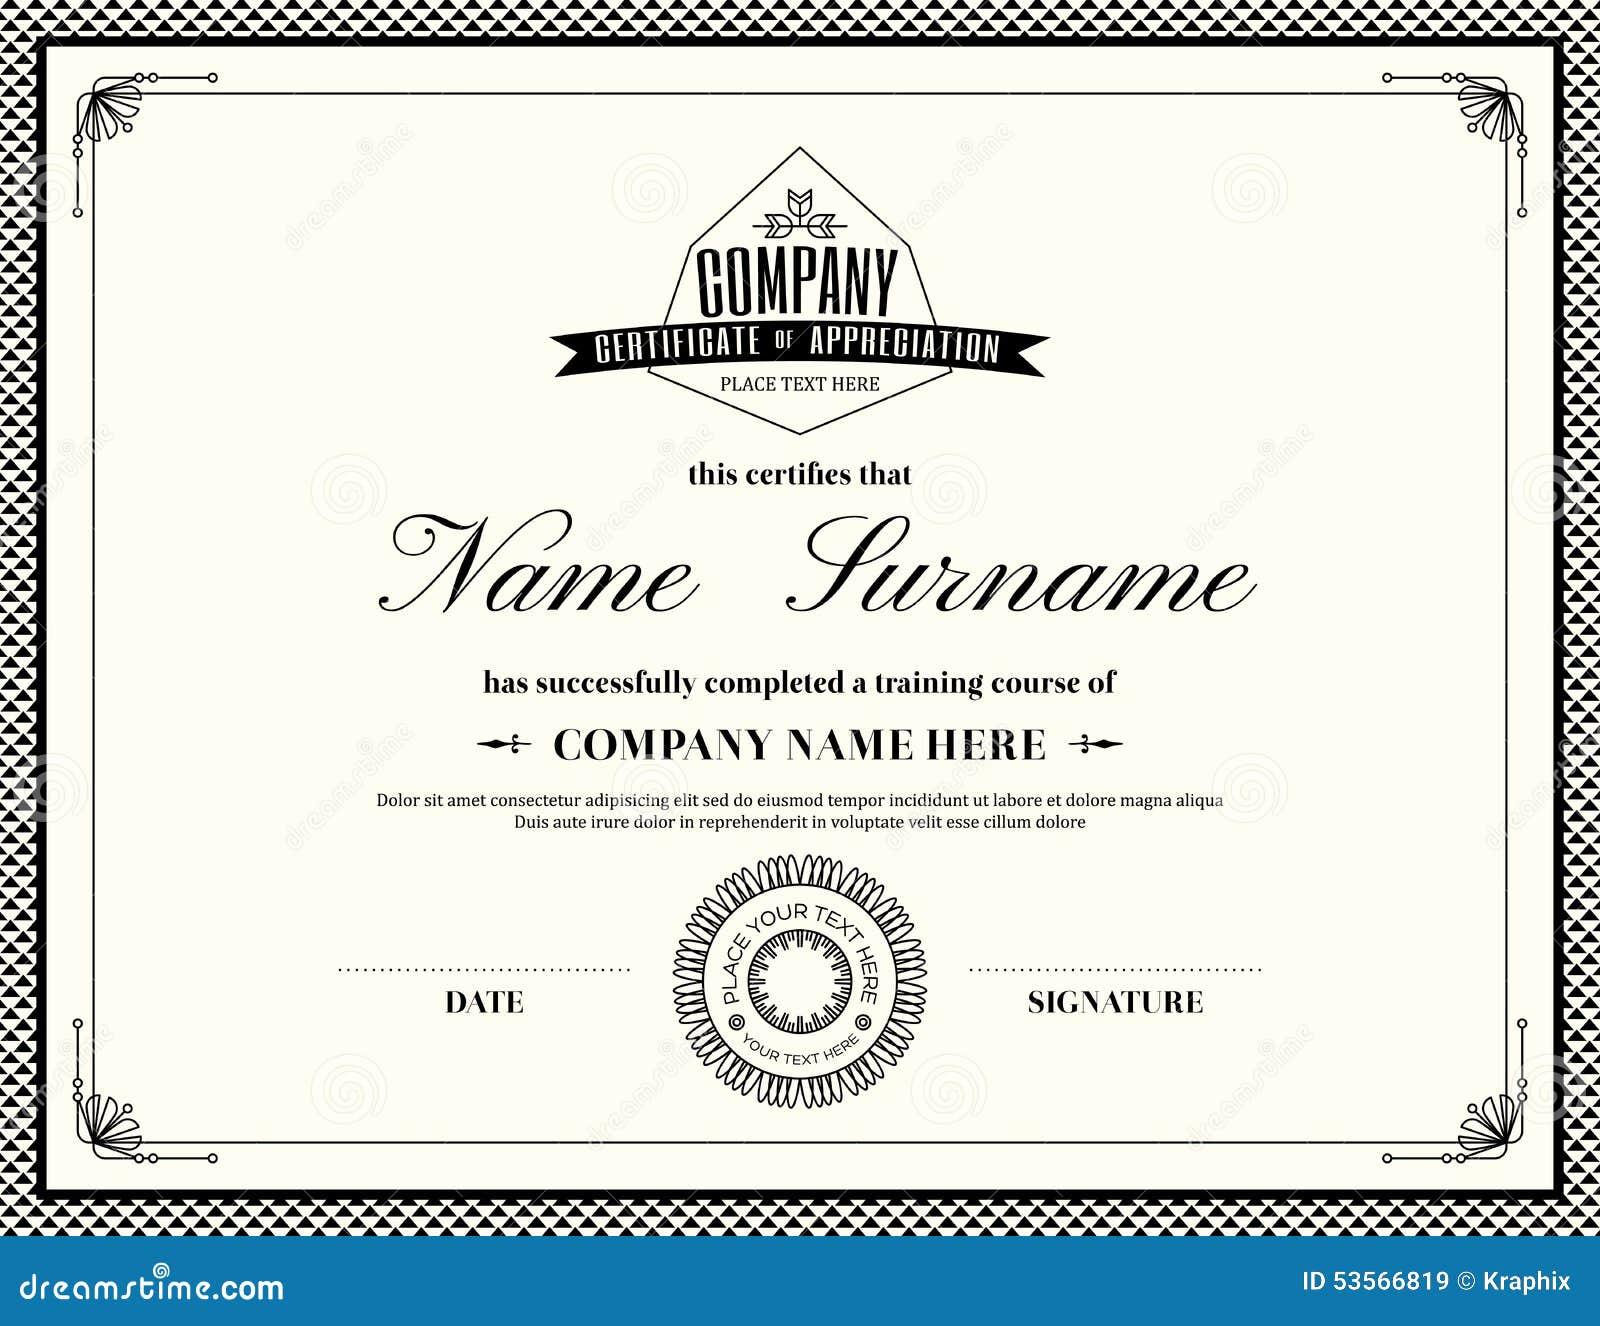 Free Certificate Of Appreciation Template Downloads Kordur